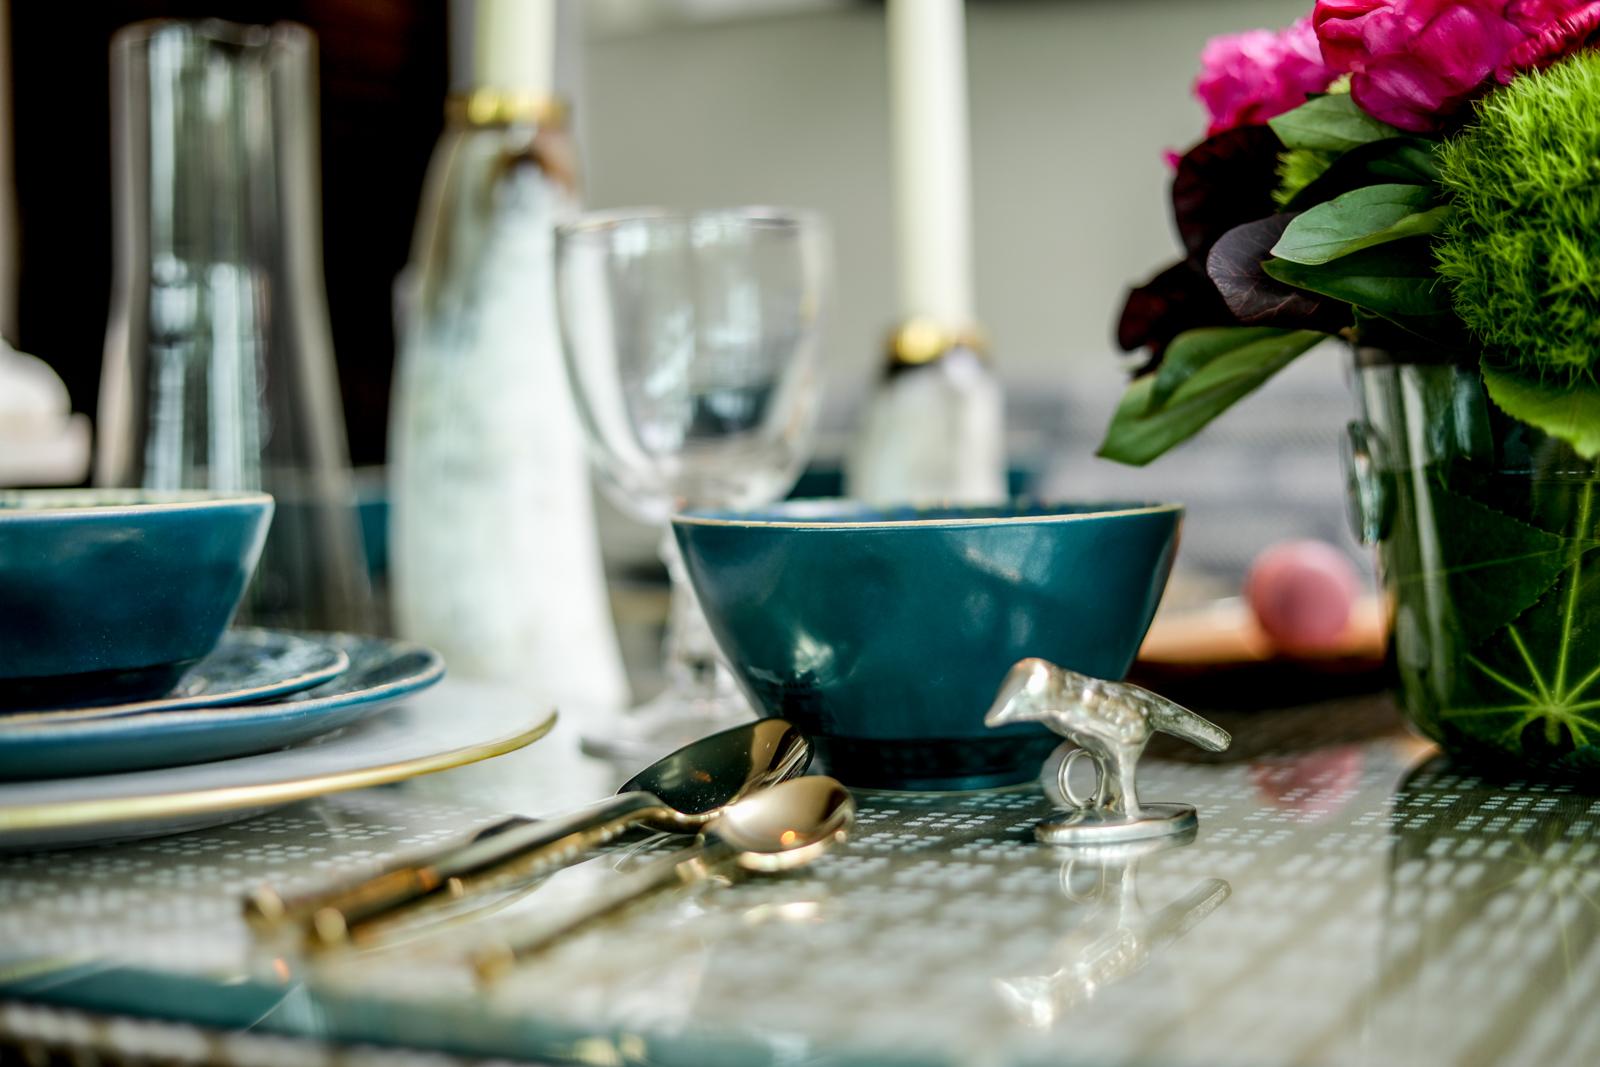 Tablescape-Modern-Textiles-Floral-Green-Gold-Dinner.jpg